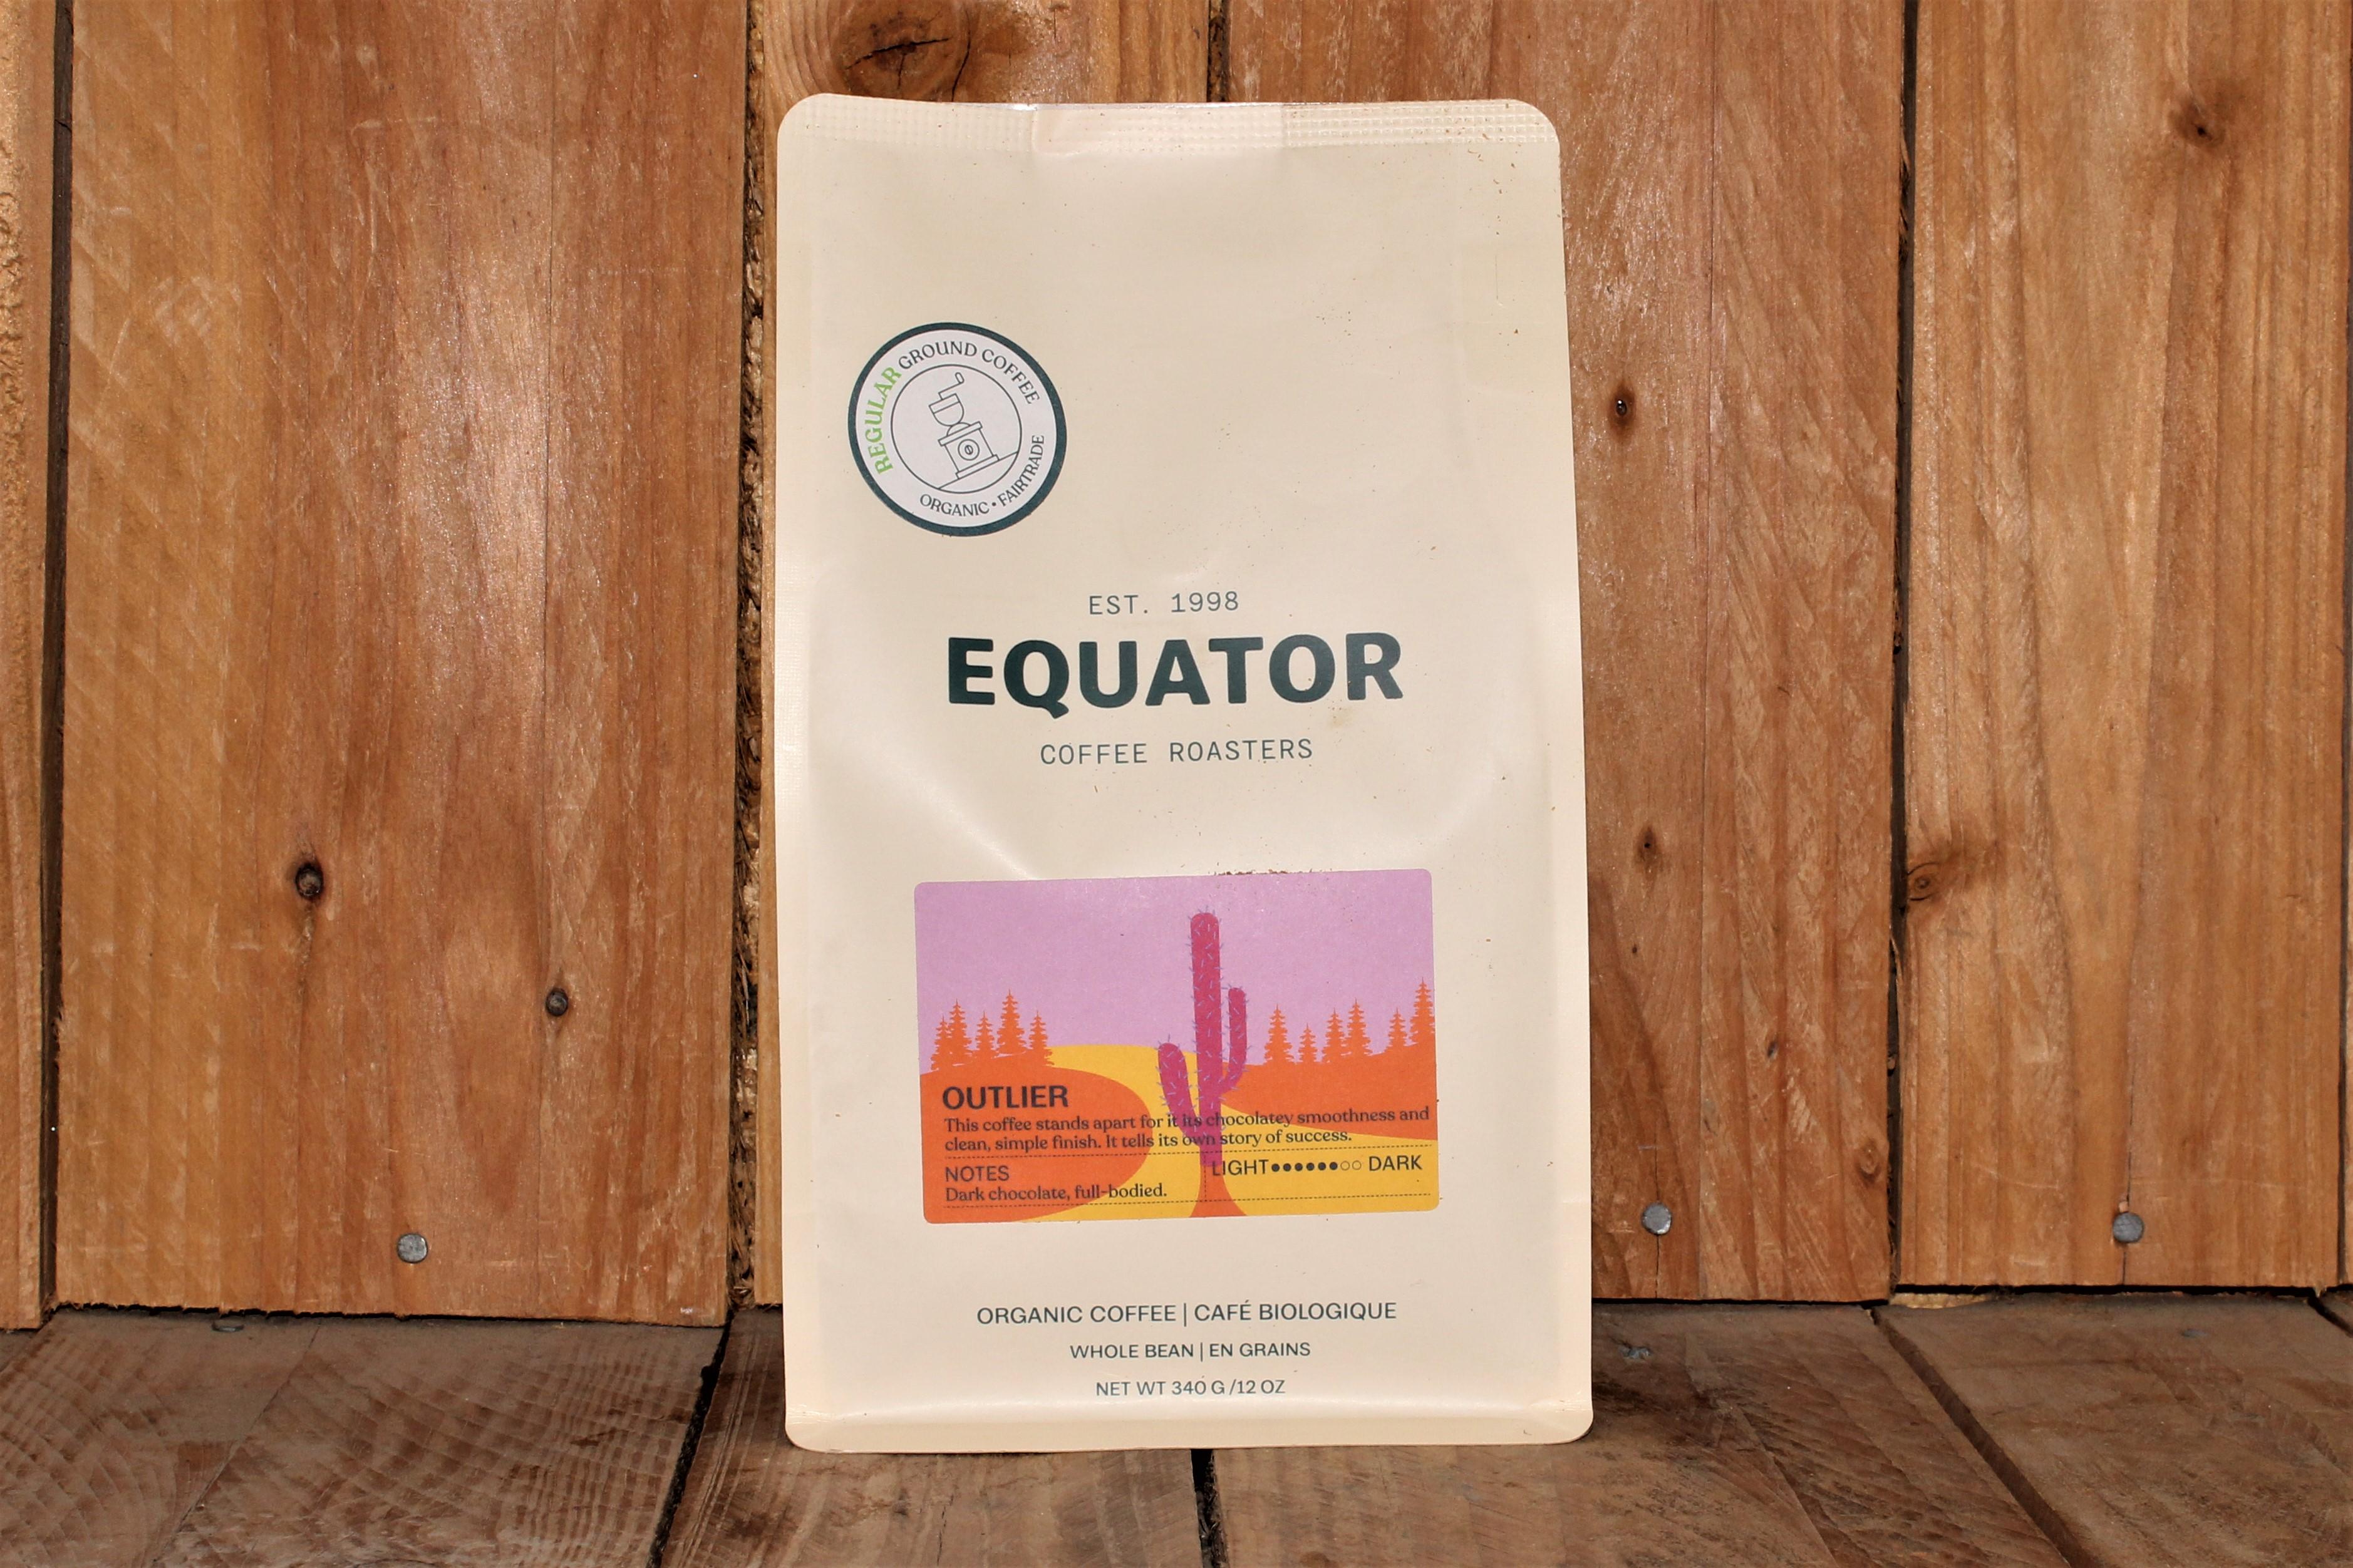 Equator – Organic Coffee – Outlier DARK (340g Bag)